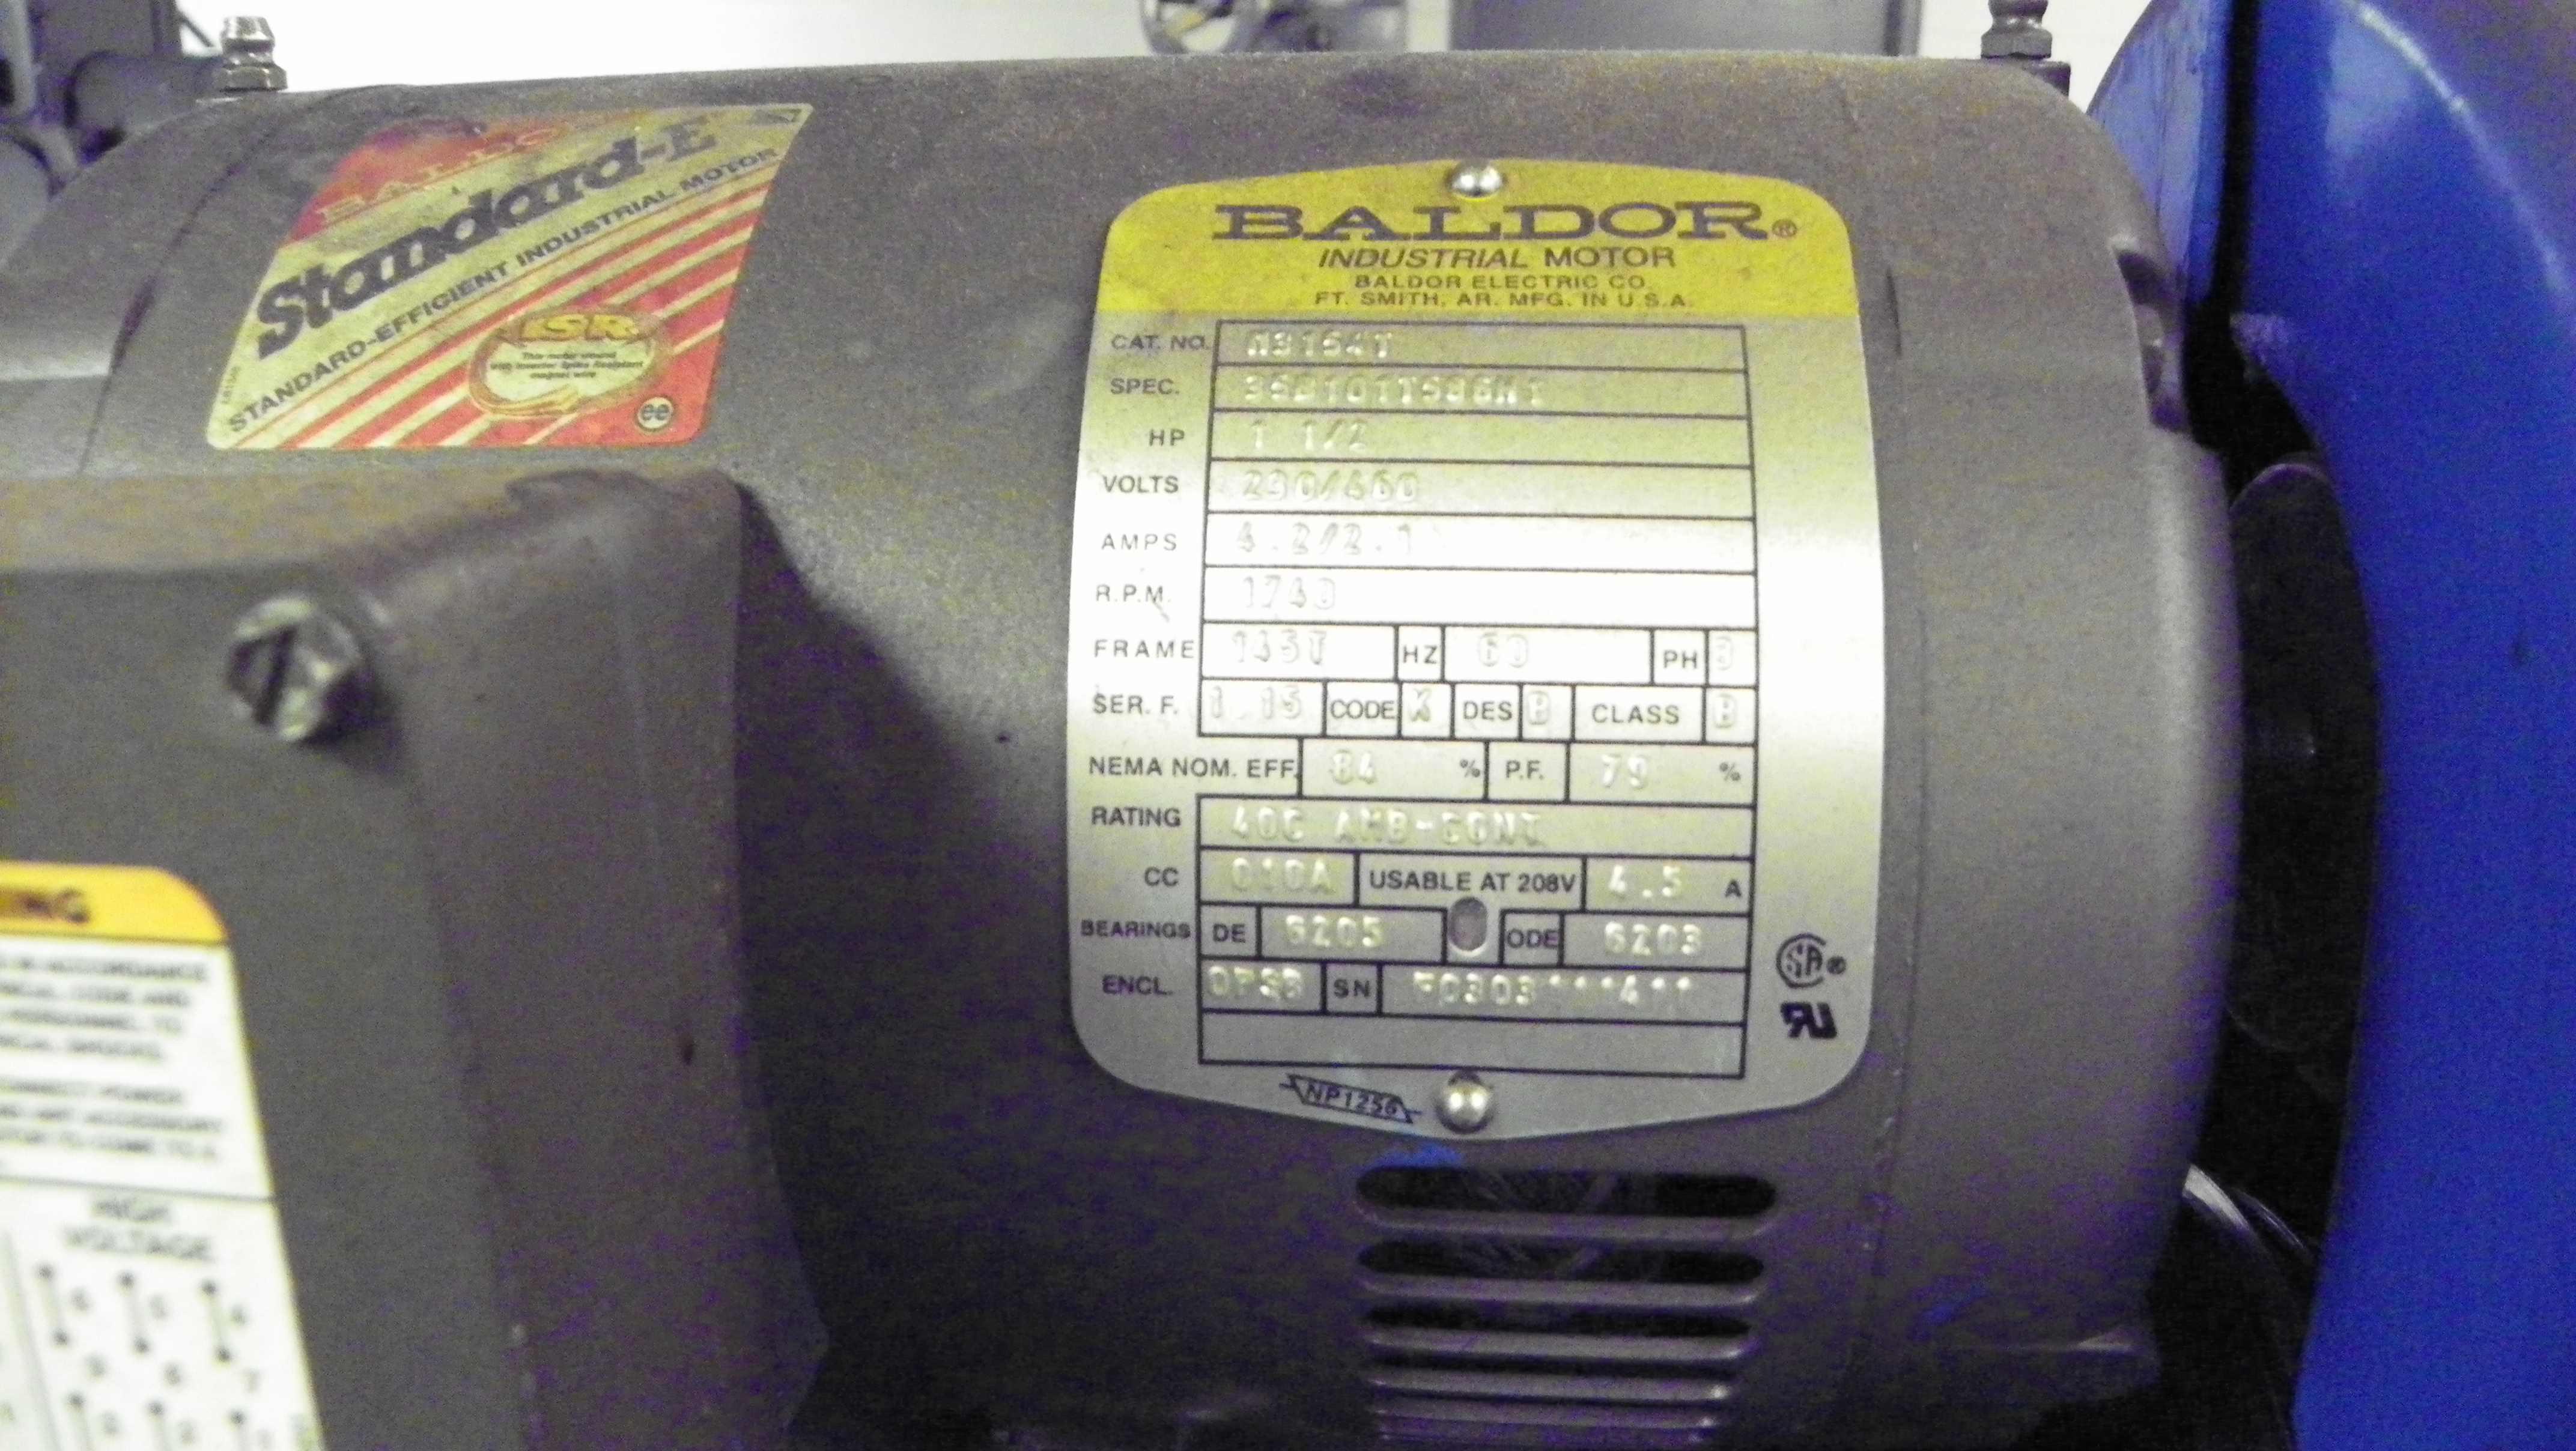 Sunnen Model 1800 Power Stroke Honing Machine, S/N 73633. Offered for parts / rebuild.